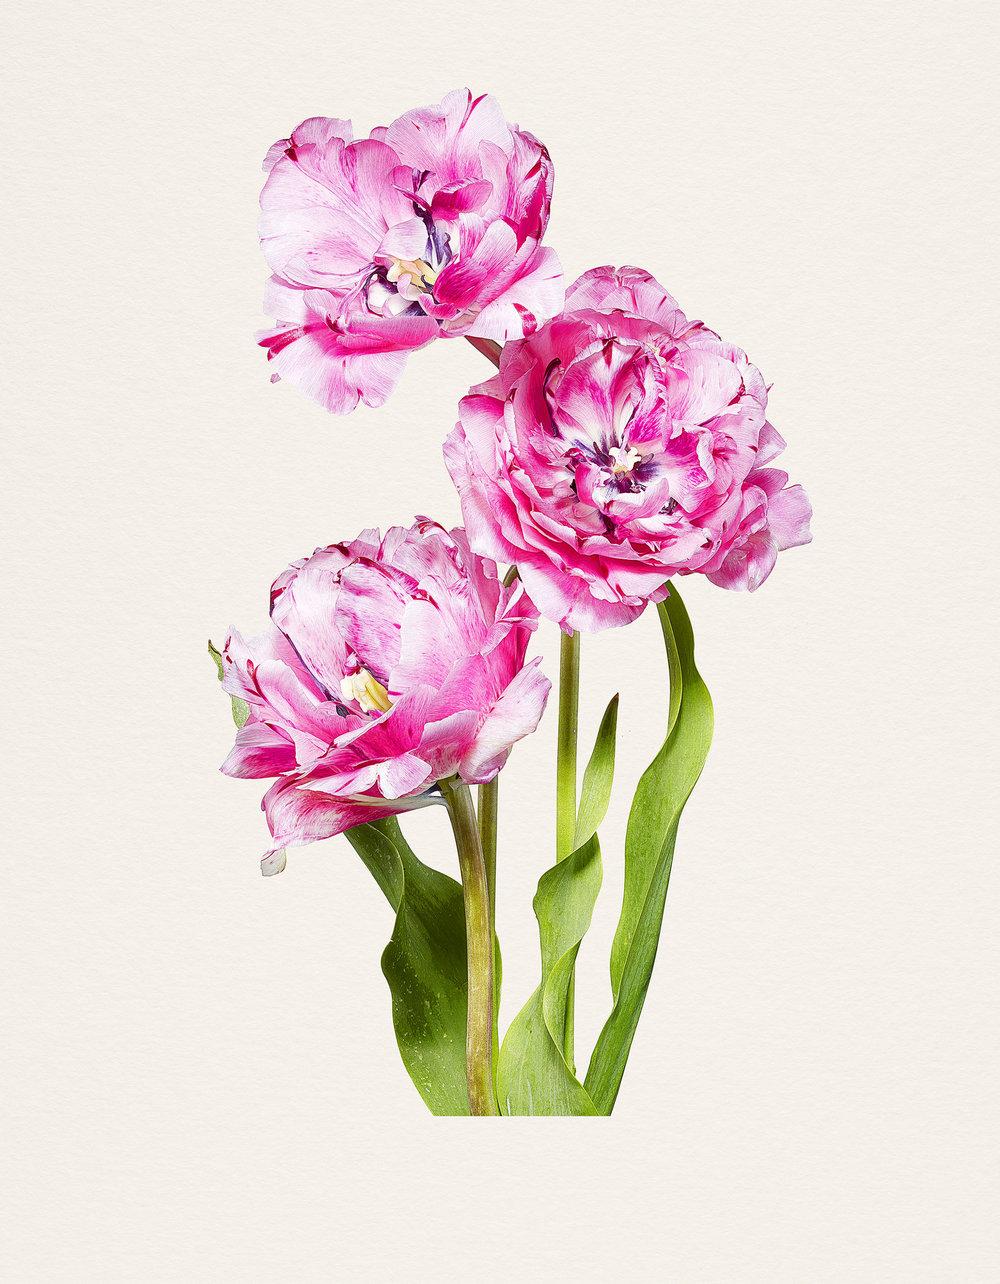 بالصور صور الورد , اجمل واحلى ورد 4661 1